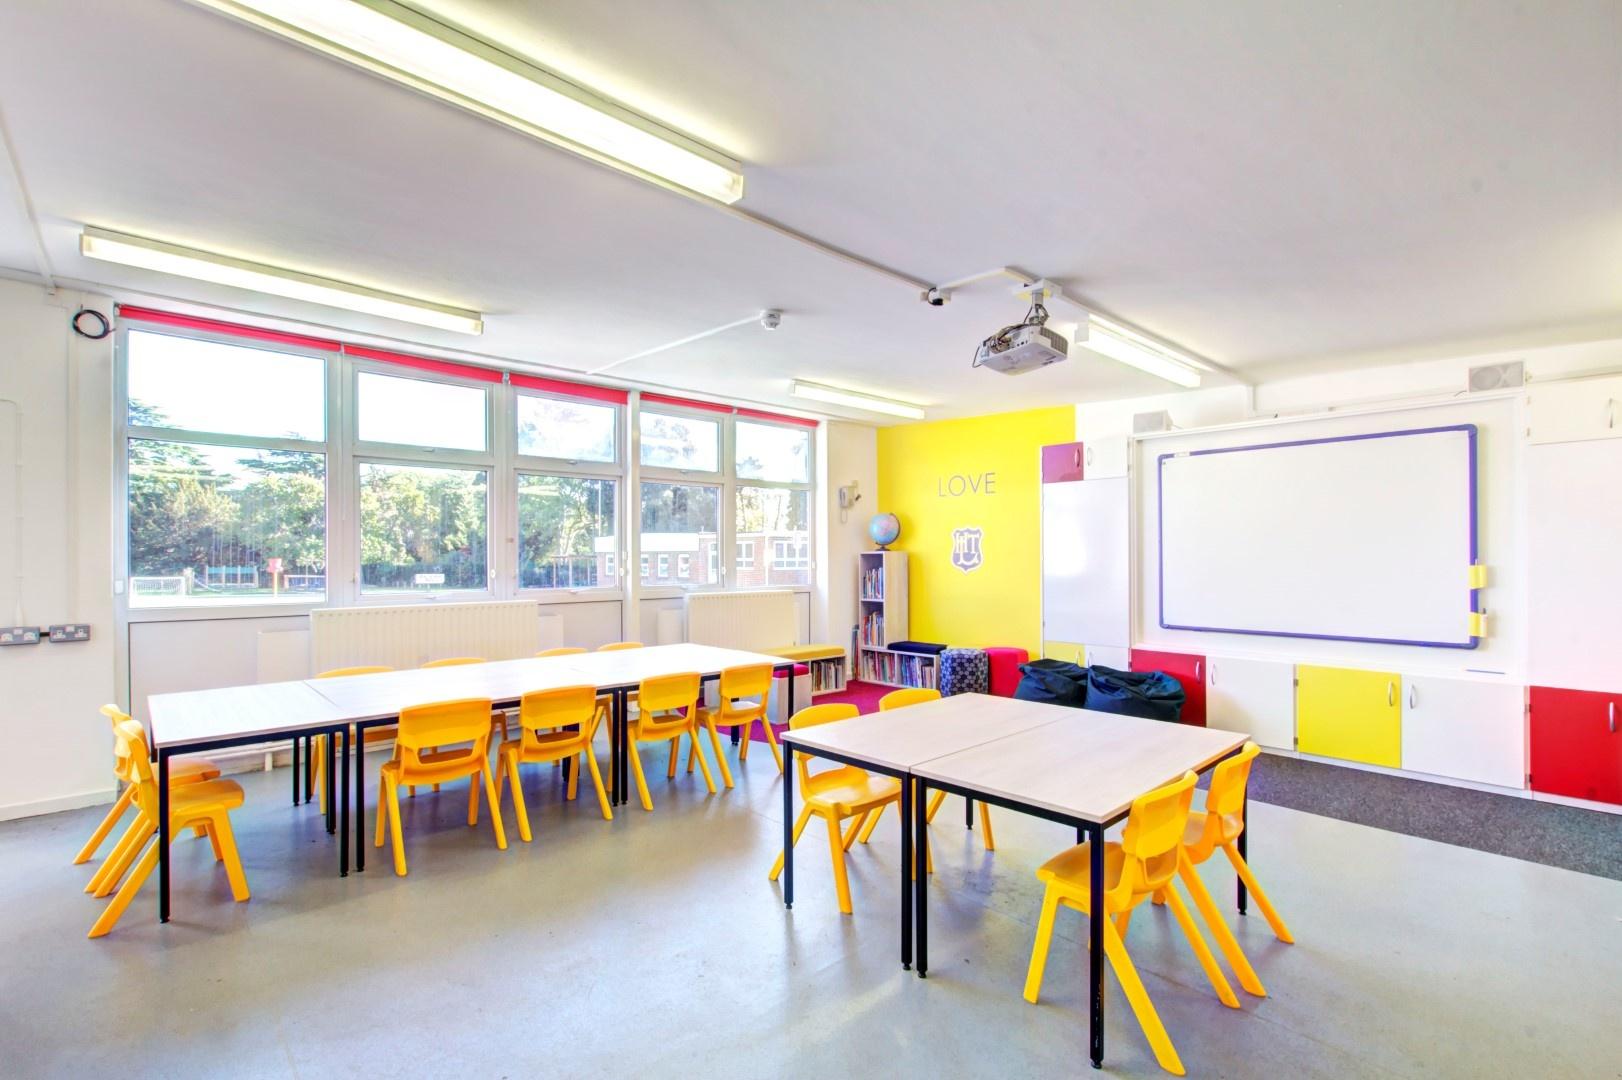 schoolspacedesignwithyellowchairsandwhiteboard_1622